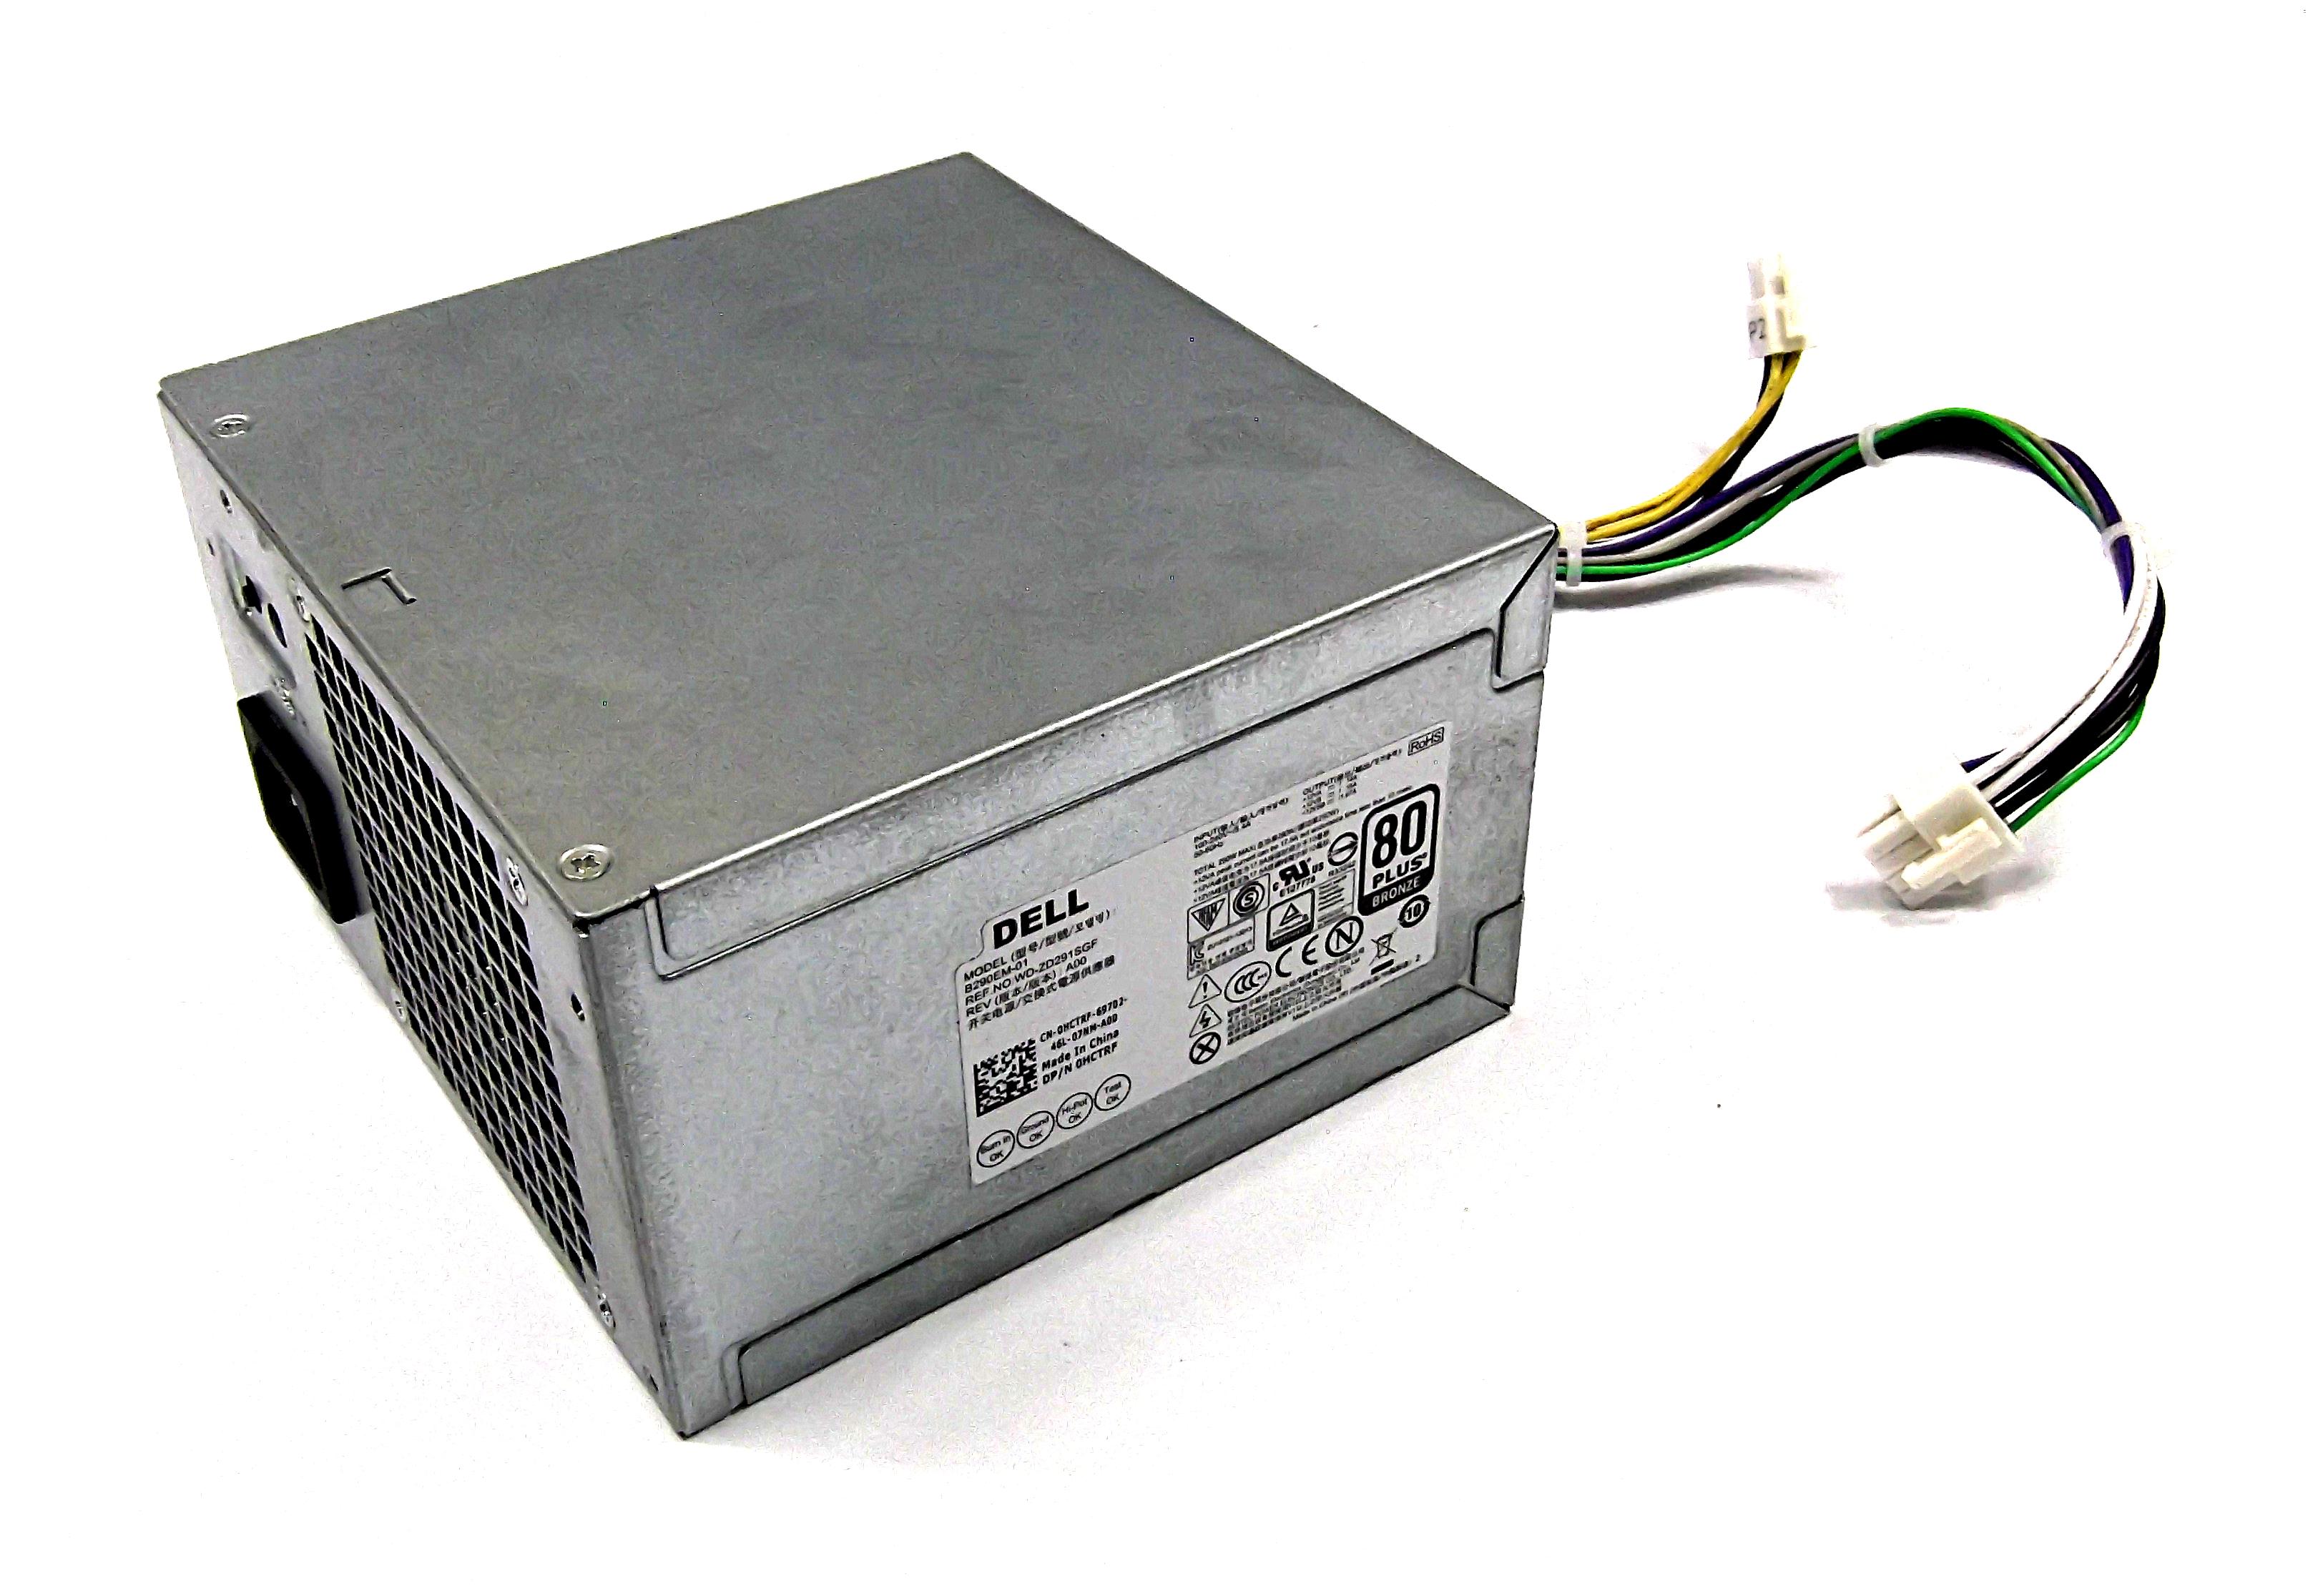 Dell HCTRF 290W 8-Pin Power Supply - Bestec B290EM-01